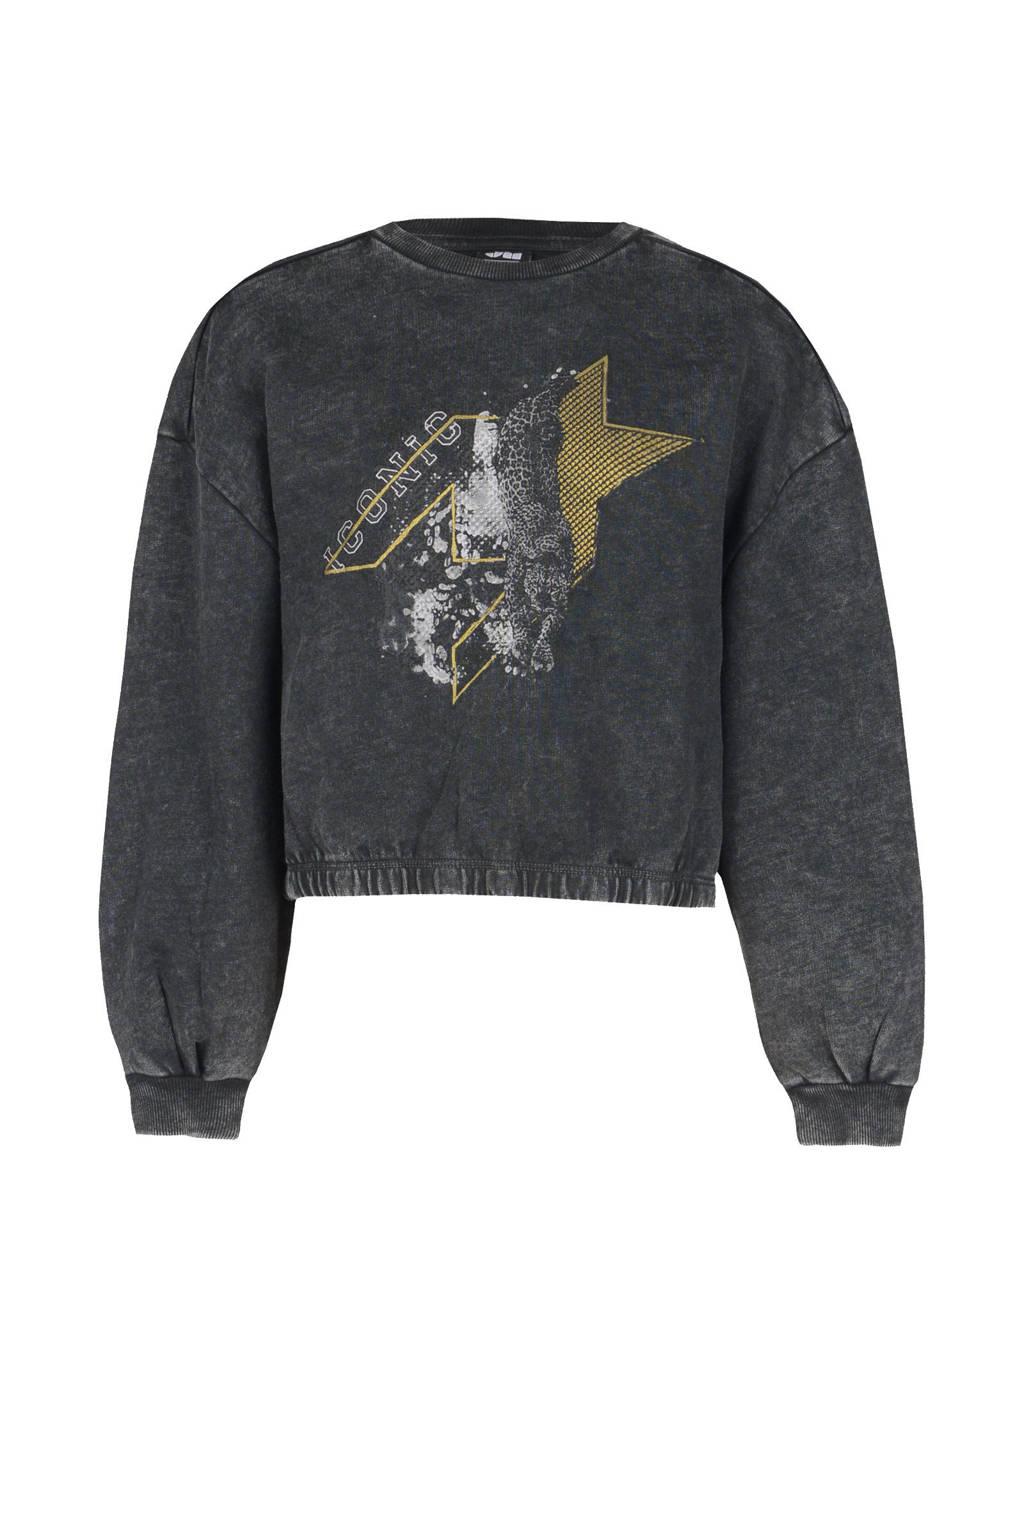 Shoeby Jill & Mitch sweater Layla met printopdruk antraciet, Antraciet